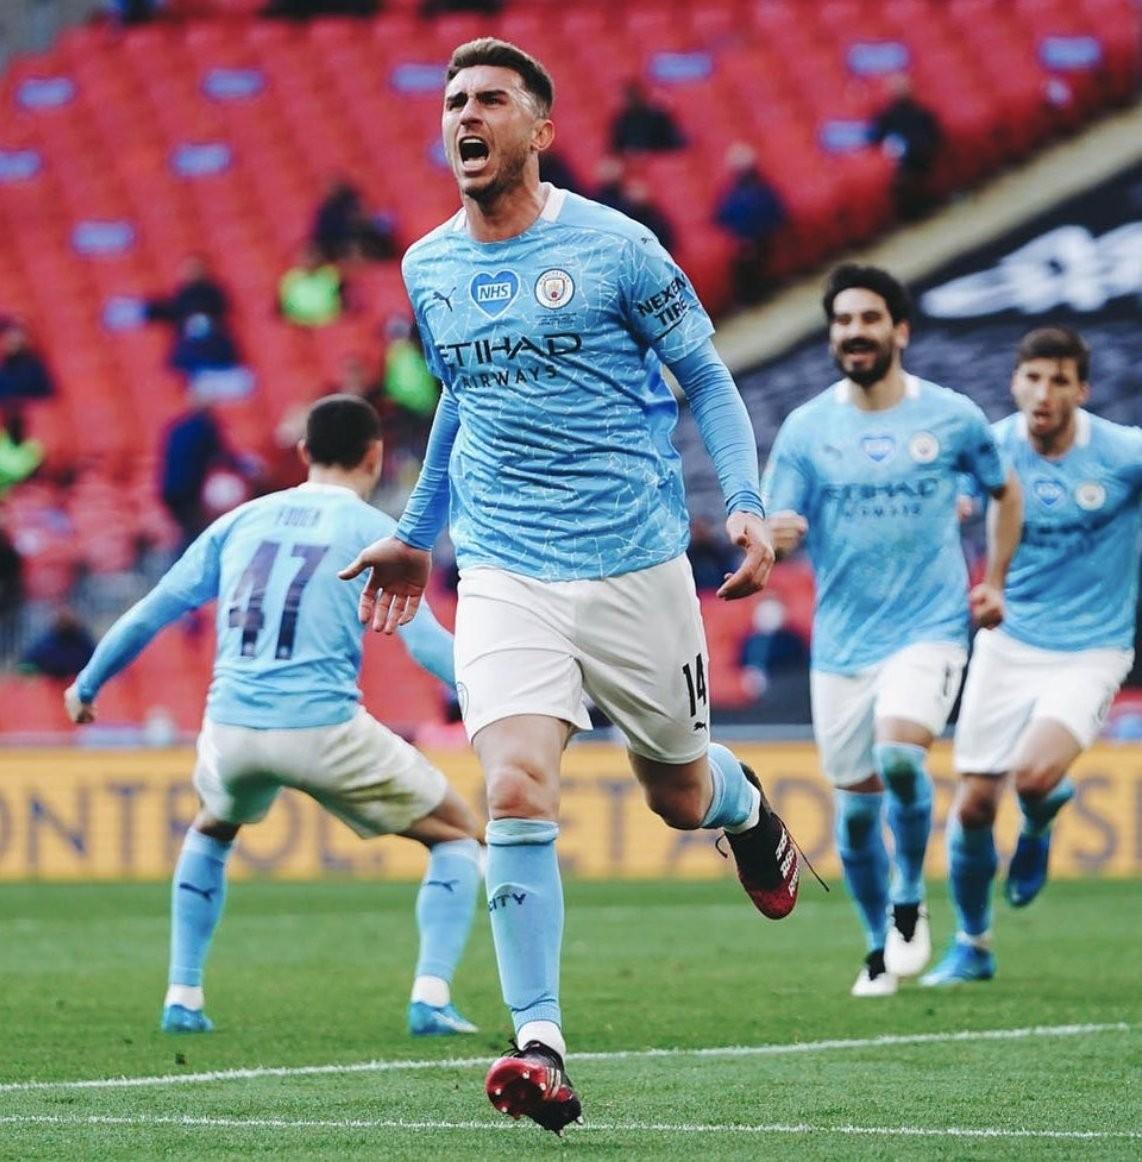 Laporte celebrando el tanto de la victoria / Foto: Manchester City